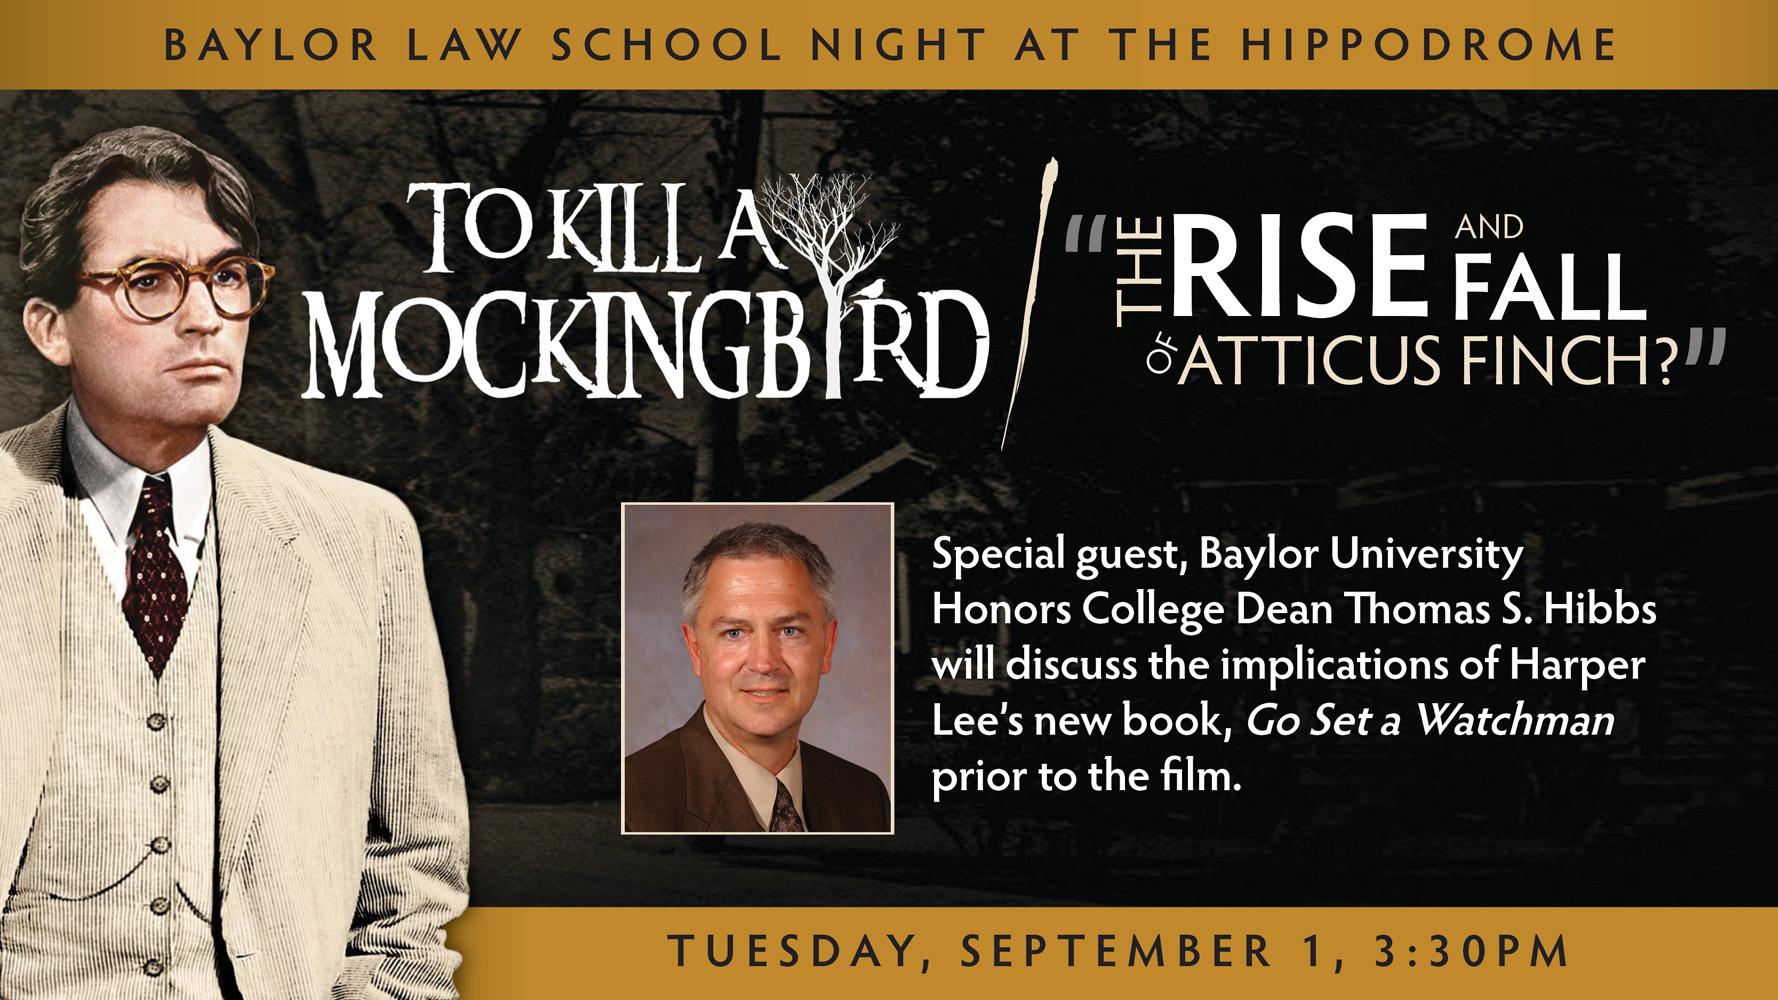 Atticus finch as a progressive father and a role model in to kill a mockingbird by harper lee